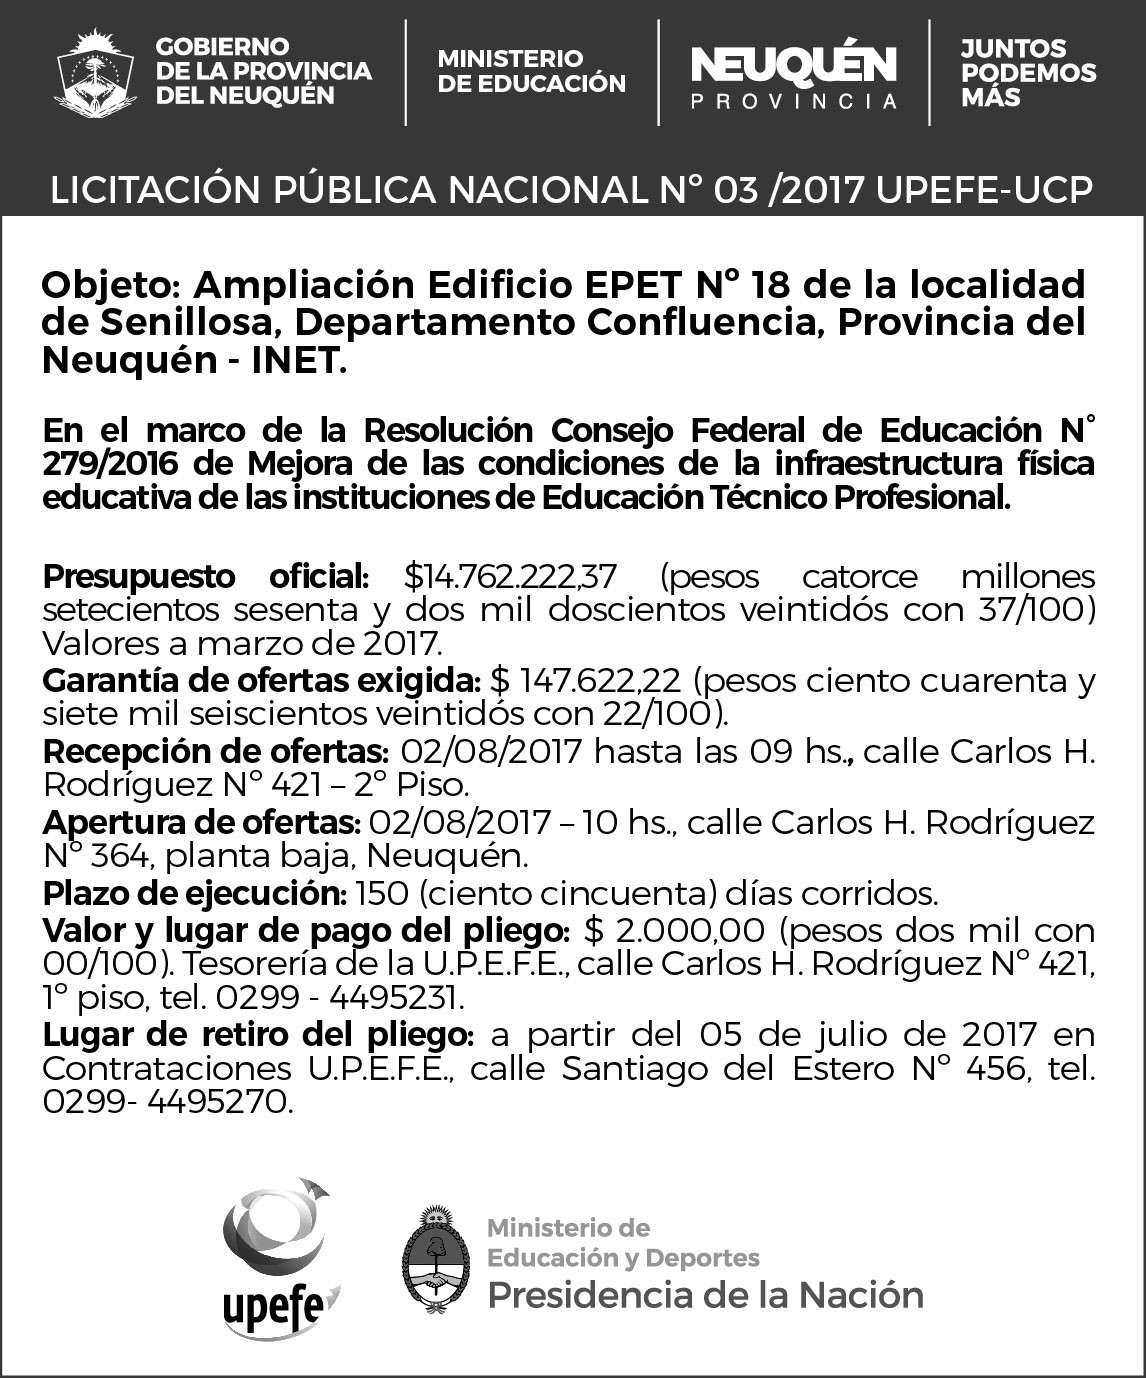 LPN03-17